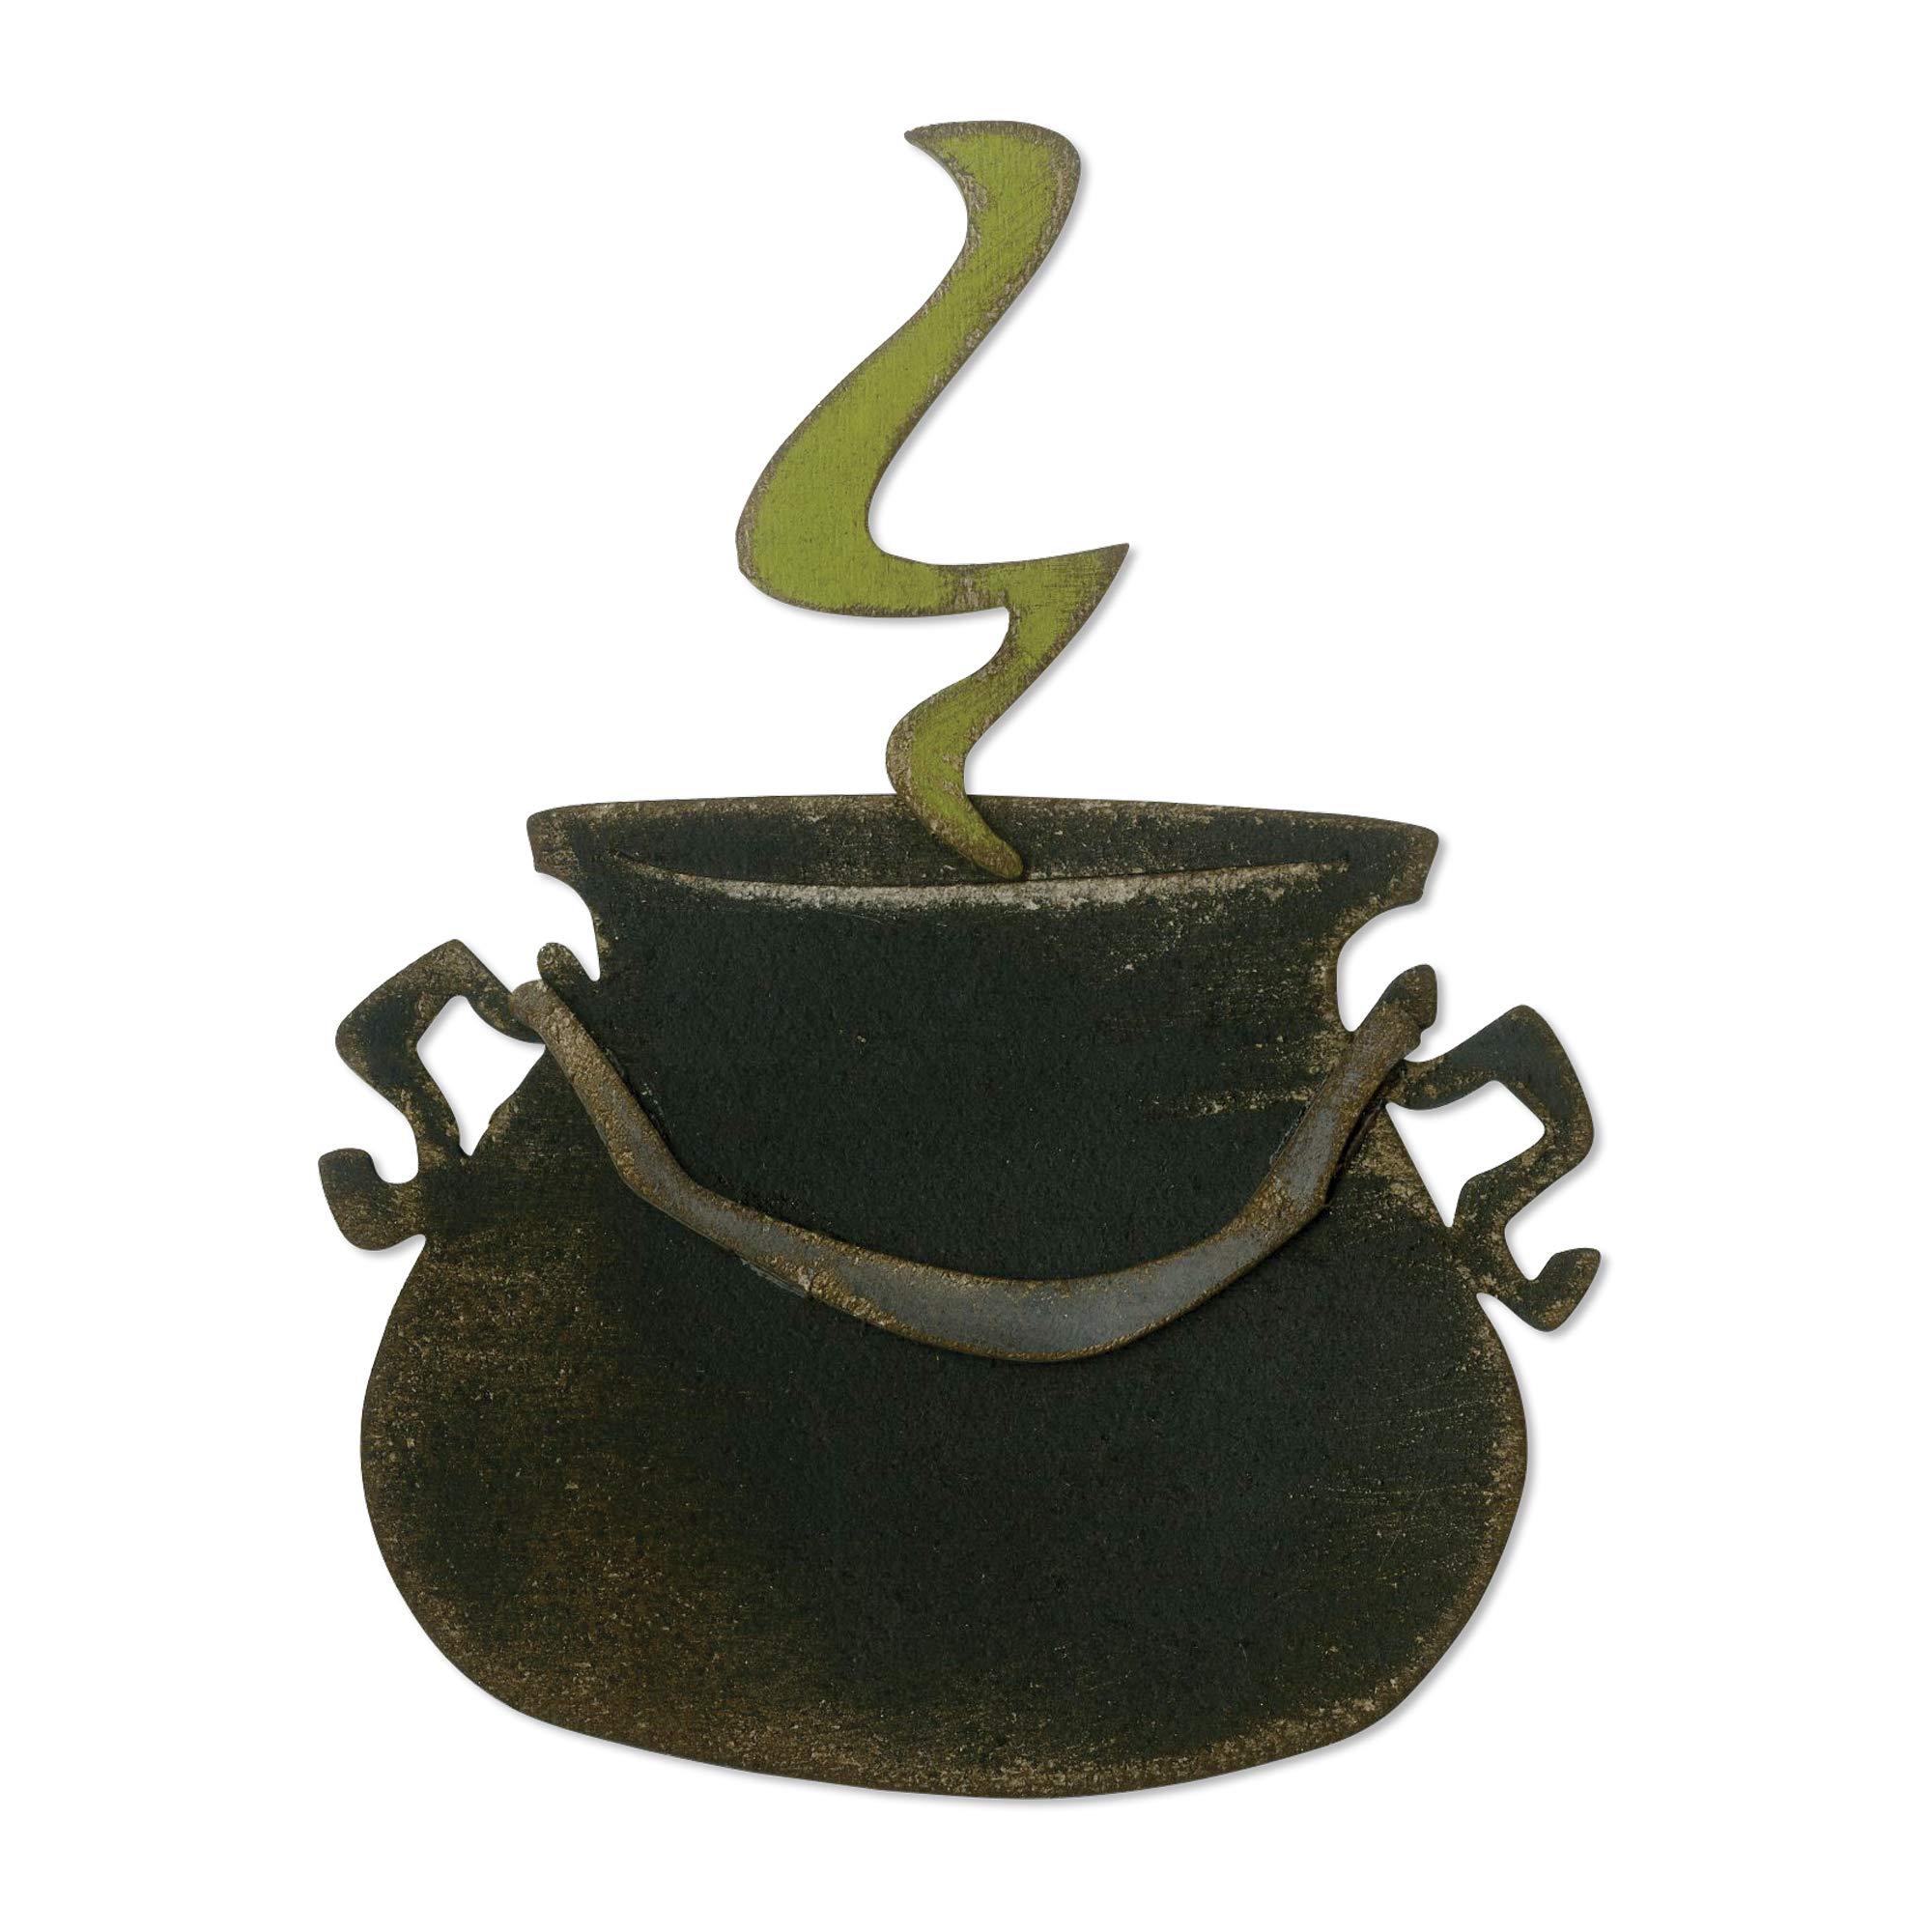 Sizzix 664214 Cauldron by Tim Holtz Dies, us:one Size, Multicolor